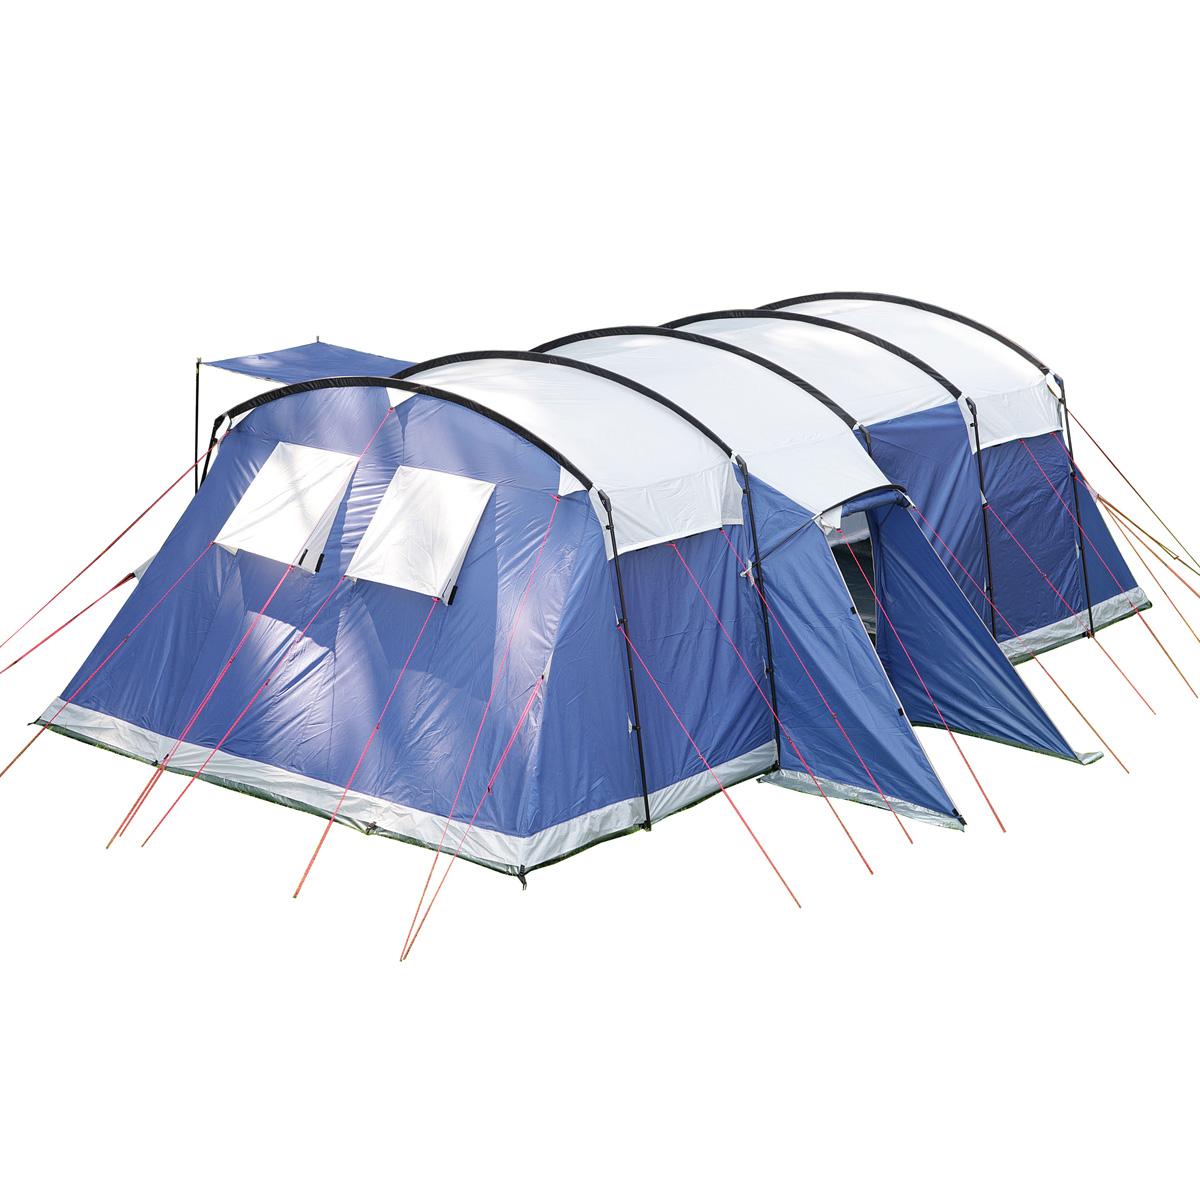 Zelt Camping : Skandika milano xxl camping familien zelt